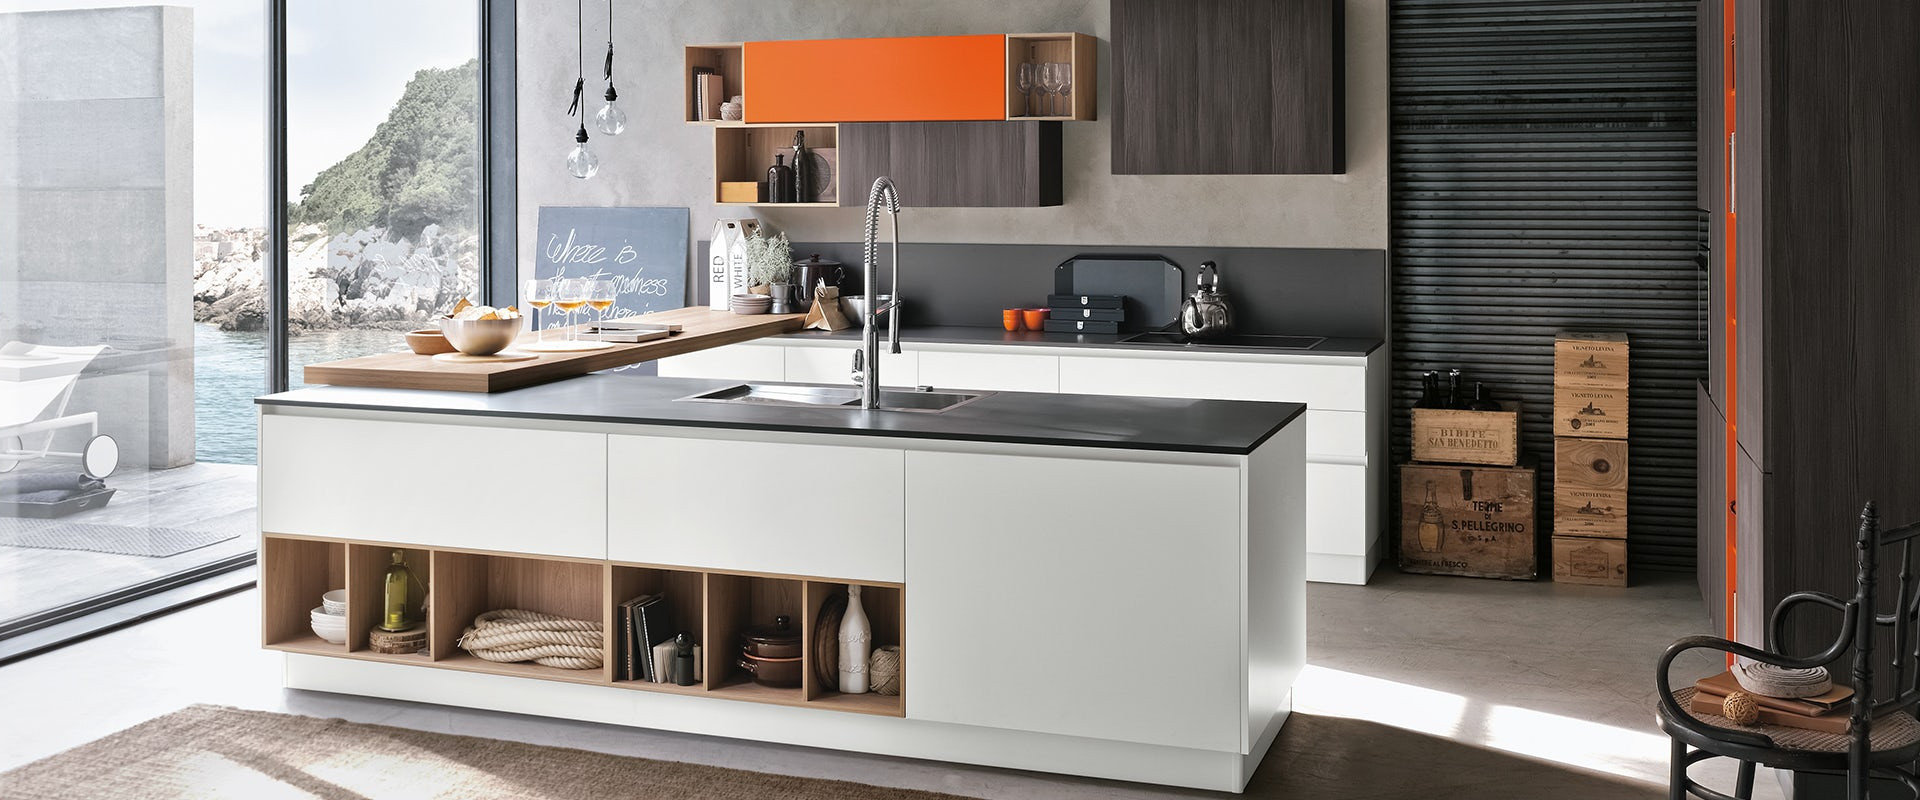 stosa-cucine-moderne-replay-302.jpg